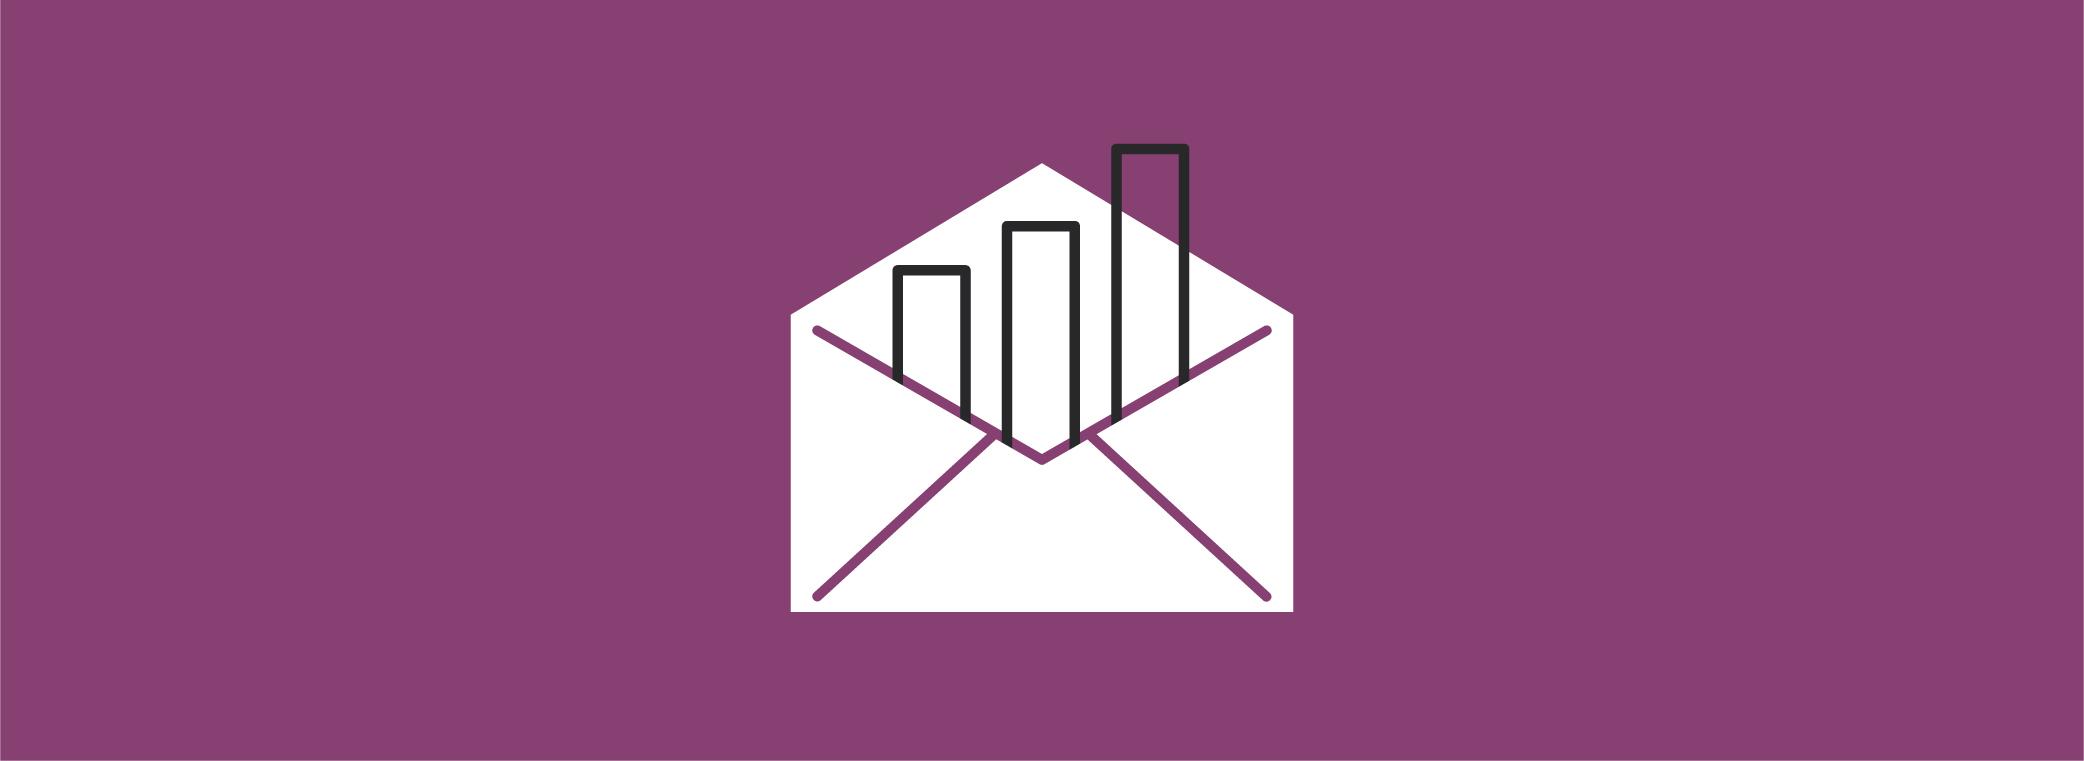 email marketing effectiveness - email marketing metrics formulas